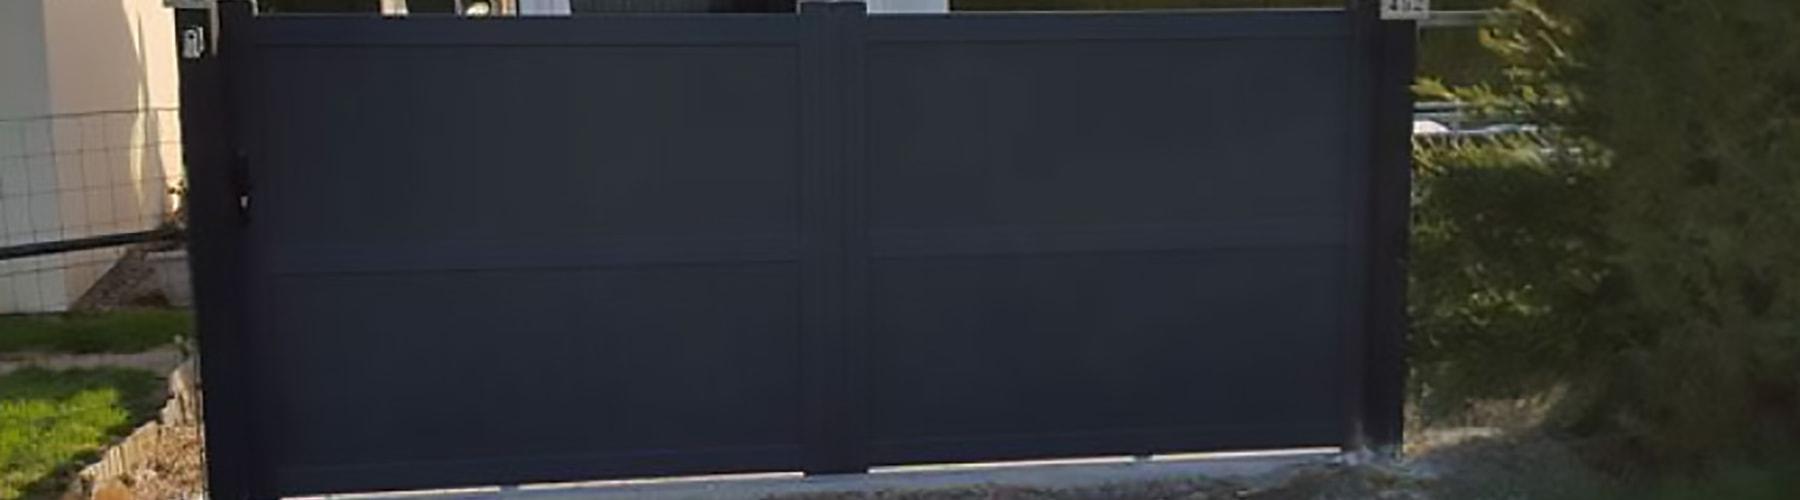 godfroy-portail-2-1800x500-min